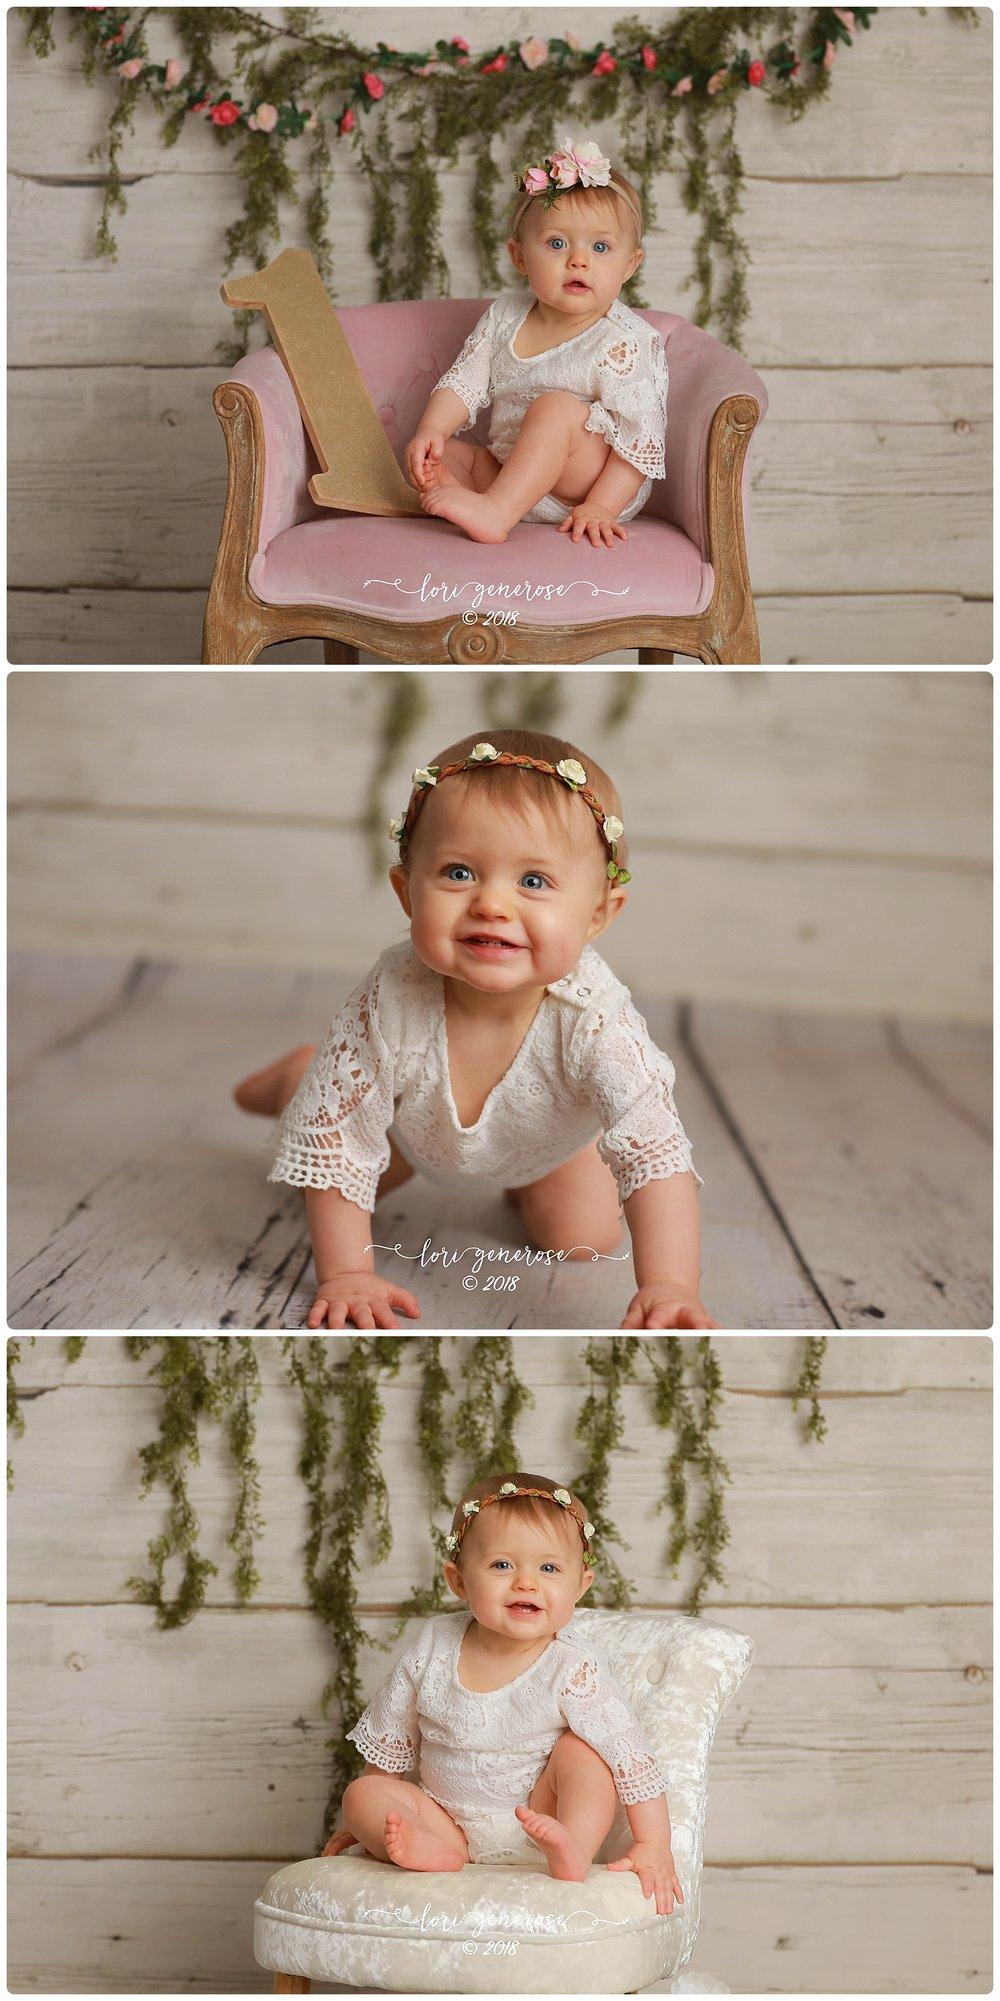 floralfirstbirthdayrosesgreenspinkchairwhitechairlgphotography.jpg